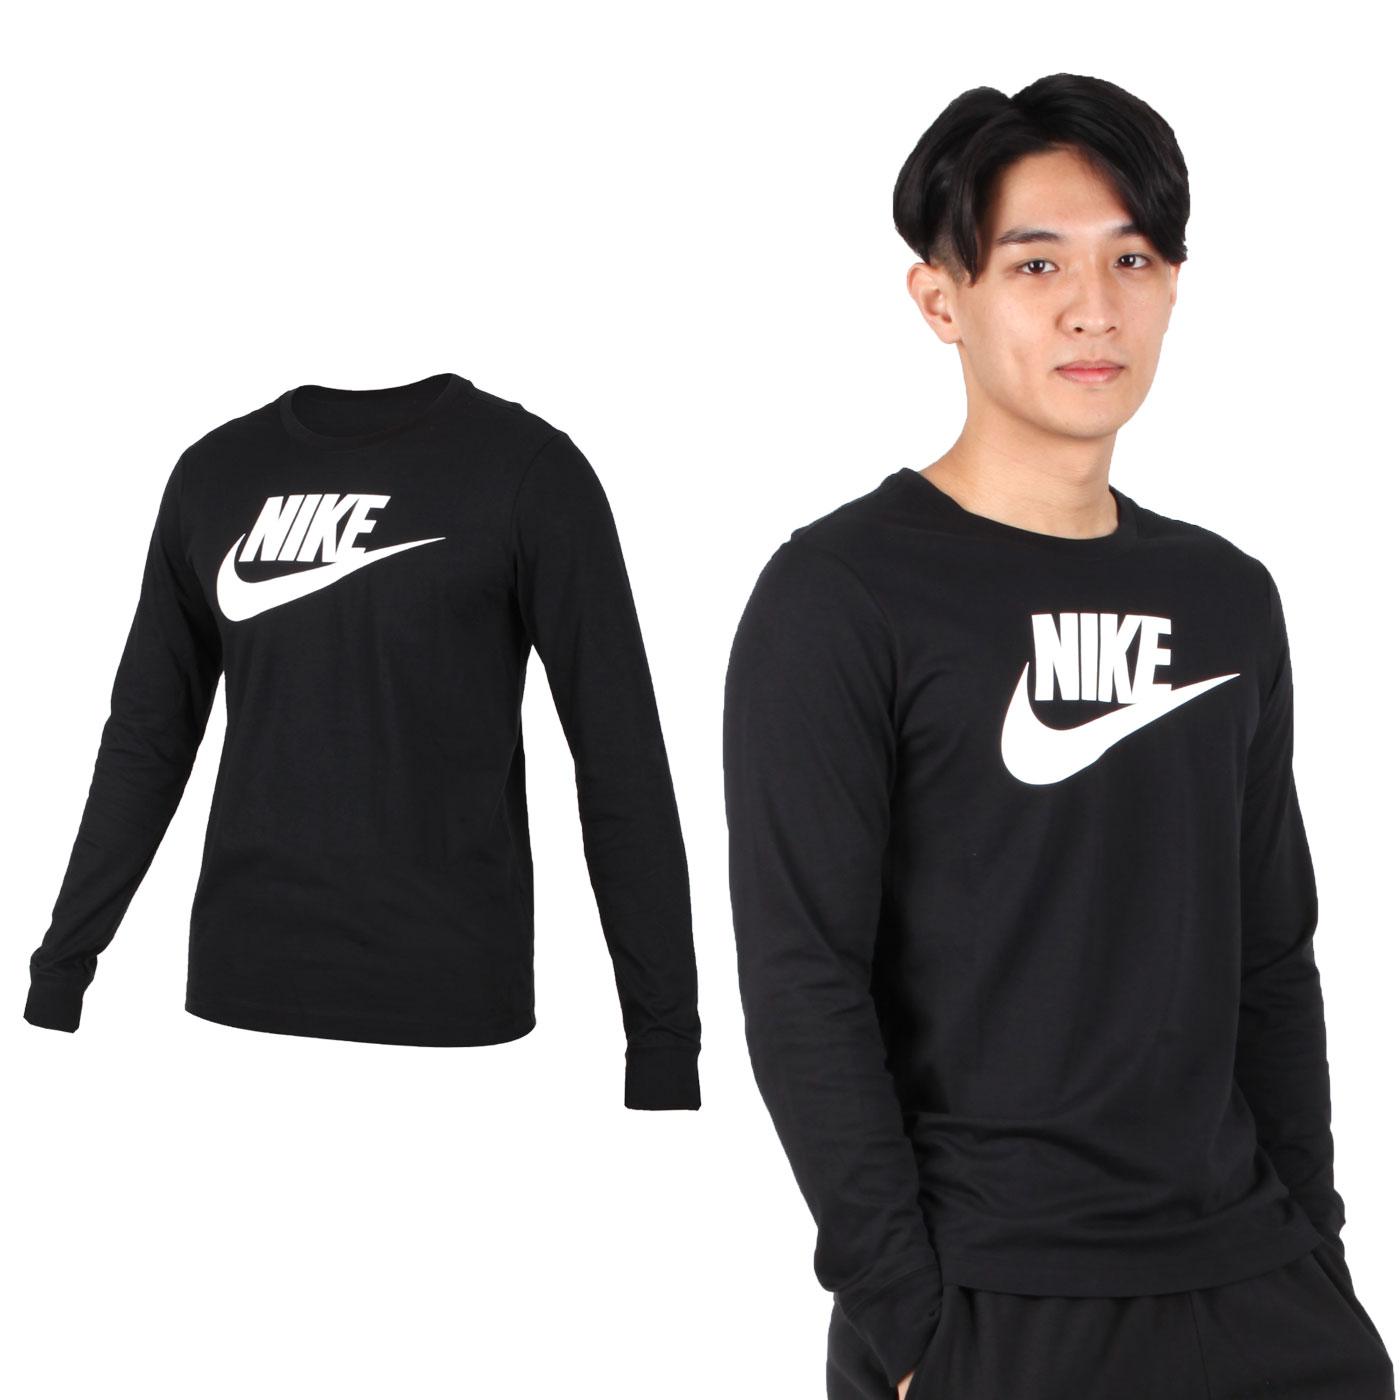 NIKE 男款薄長袖圓領T恤 CI6292-010